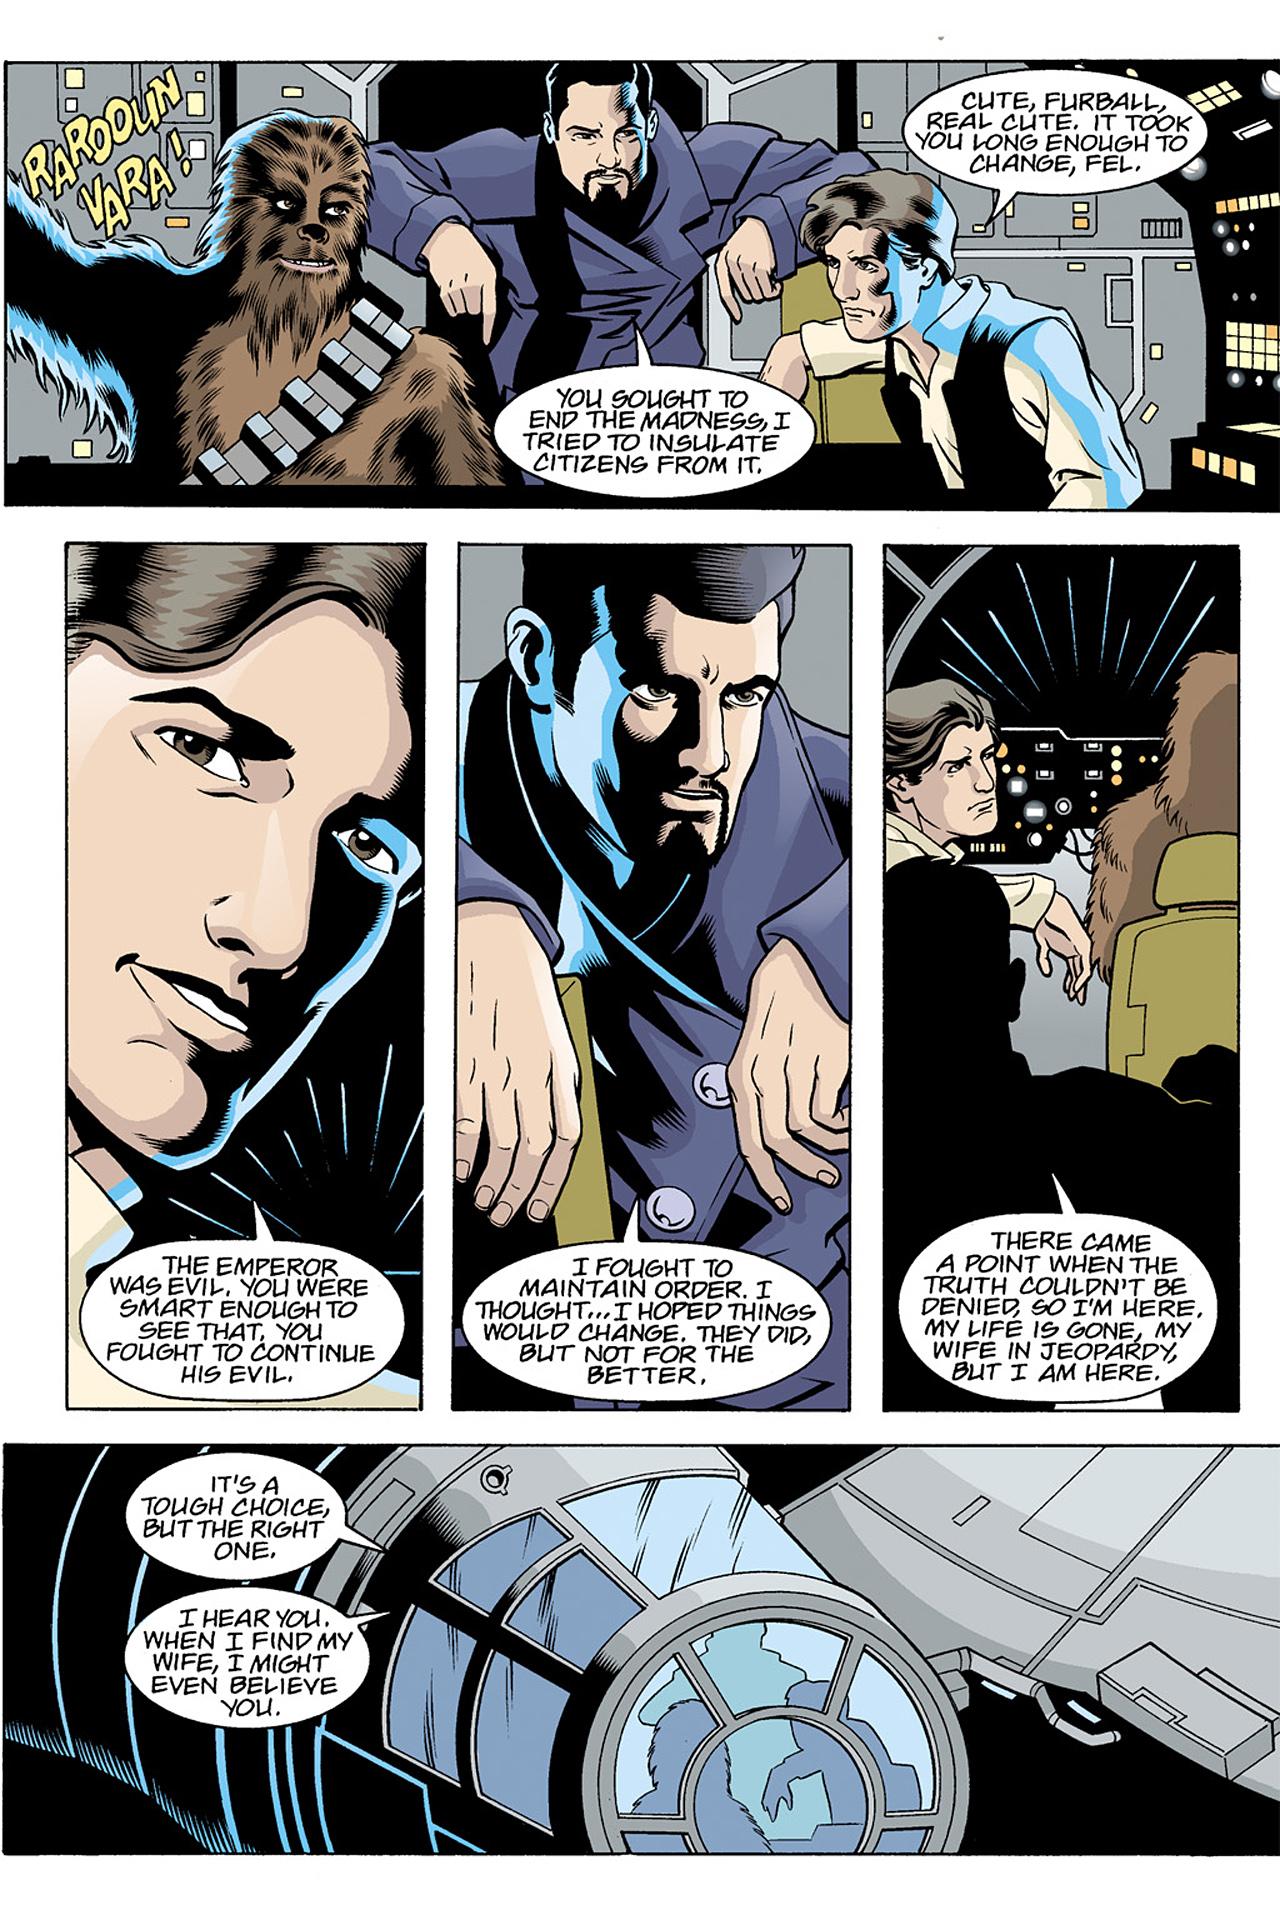 Read online Star Wars Omnibus comic -  Issue # Vol. 3 - 197